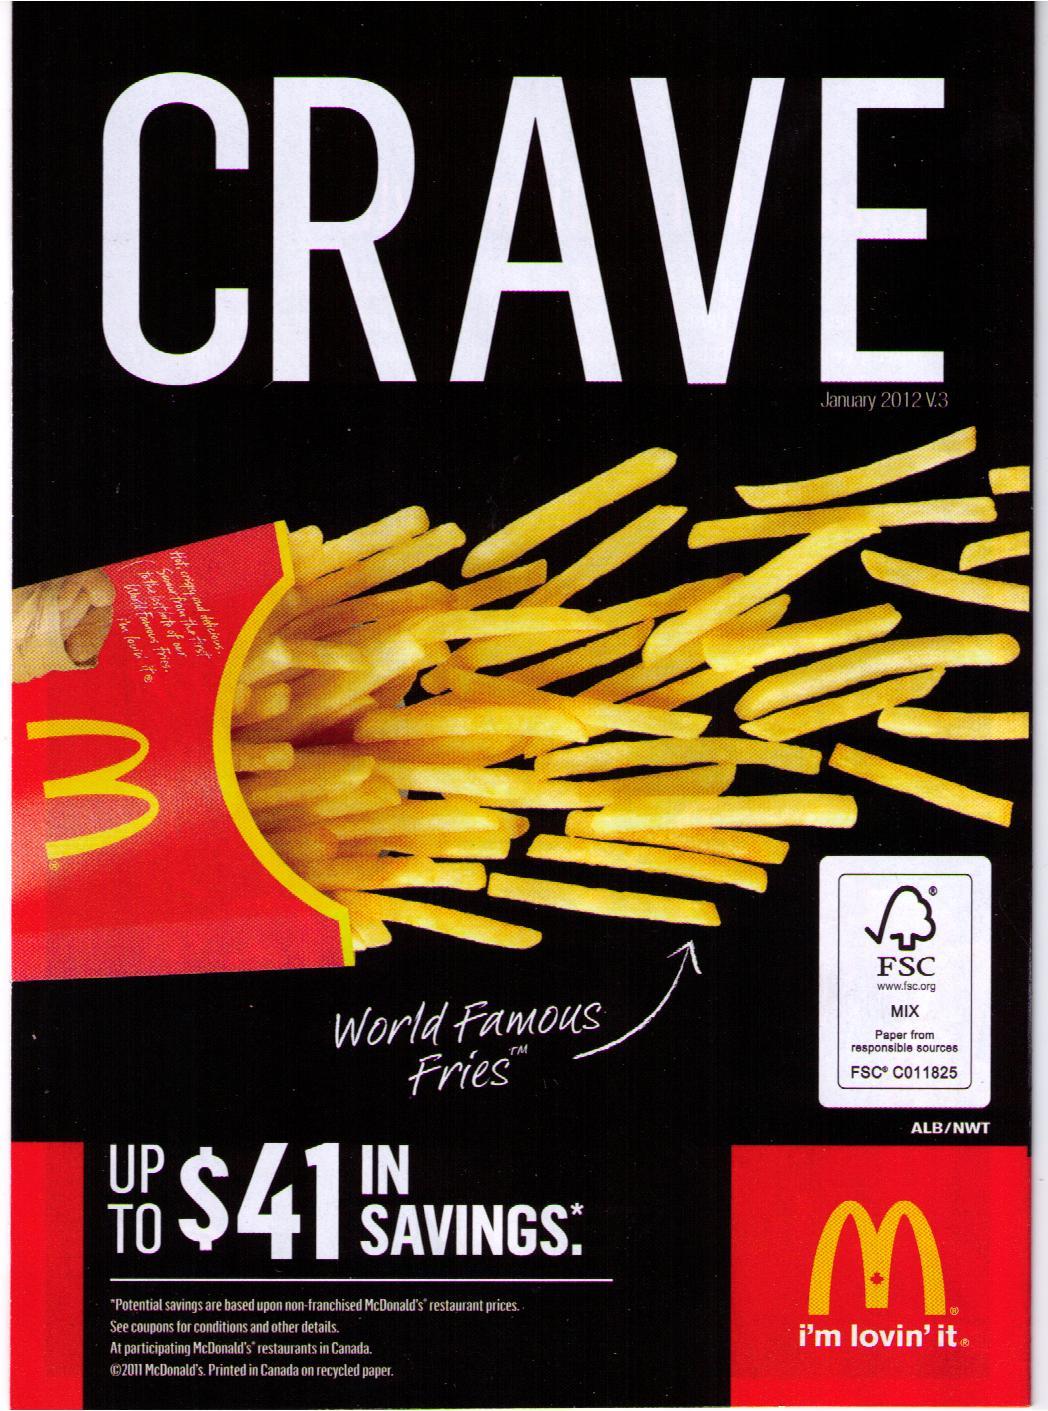 2012-01-08-Crave001.jpg